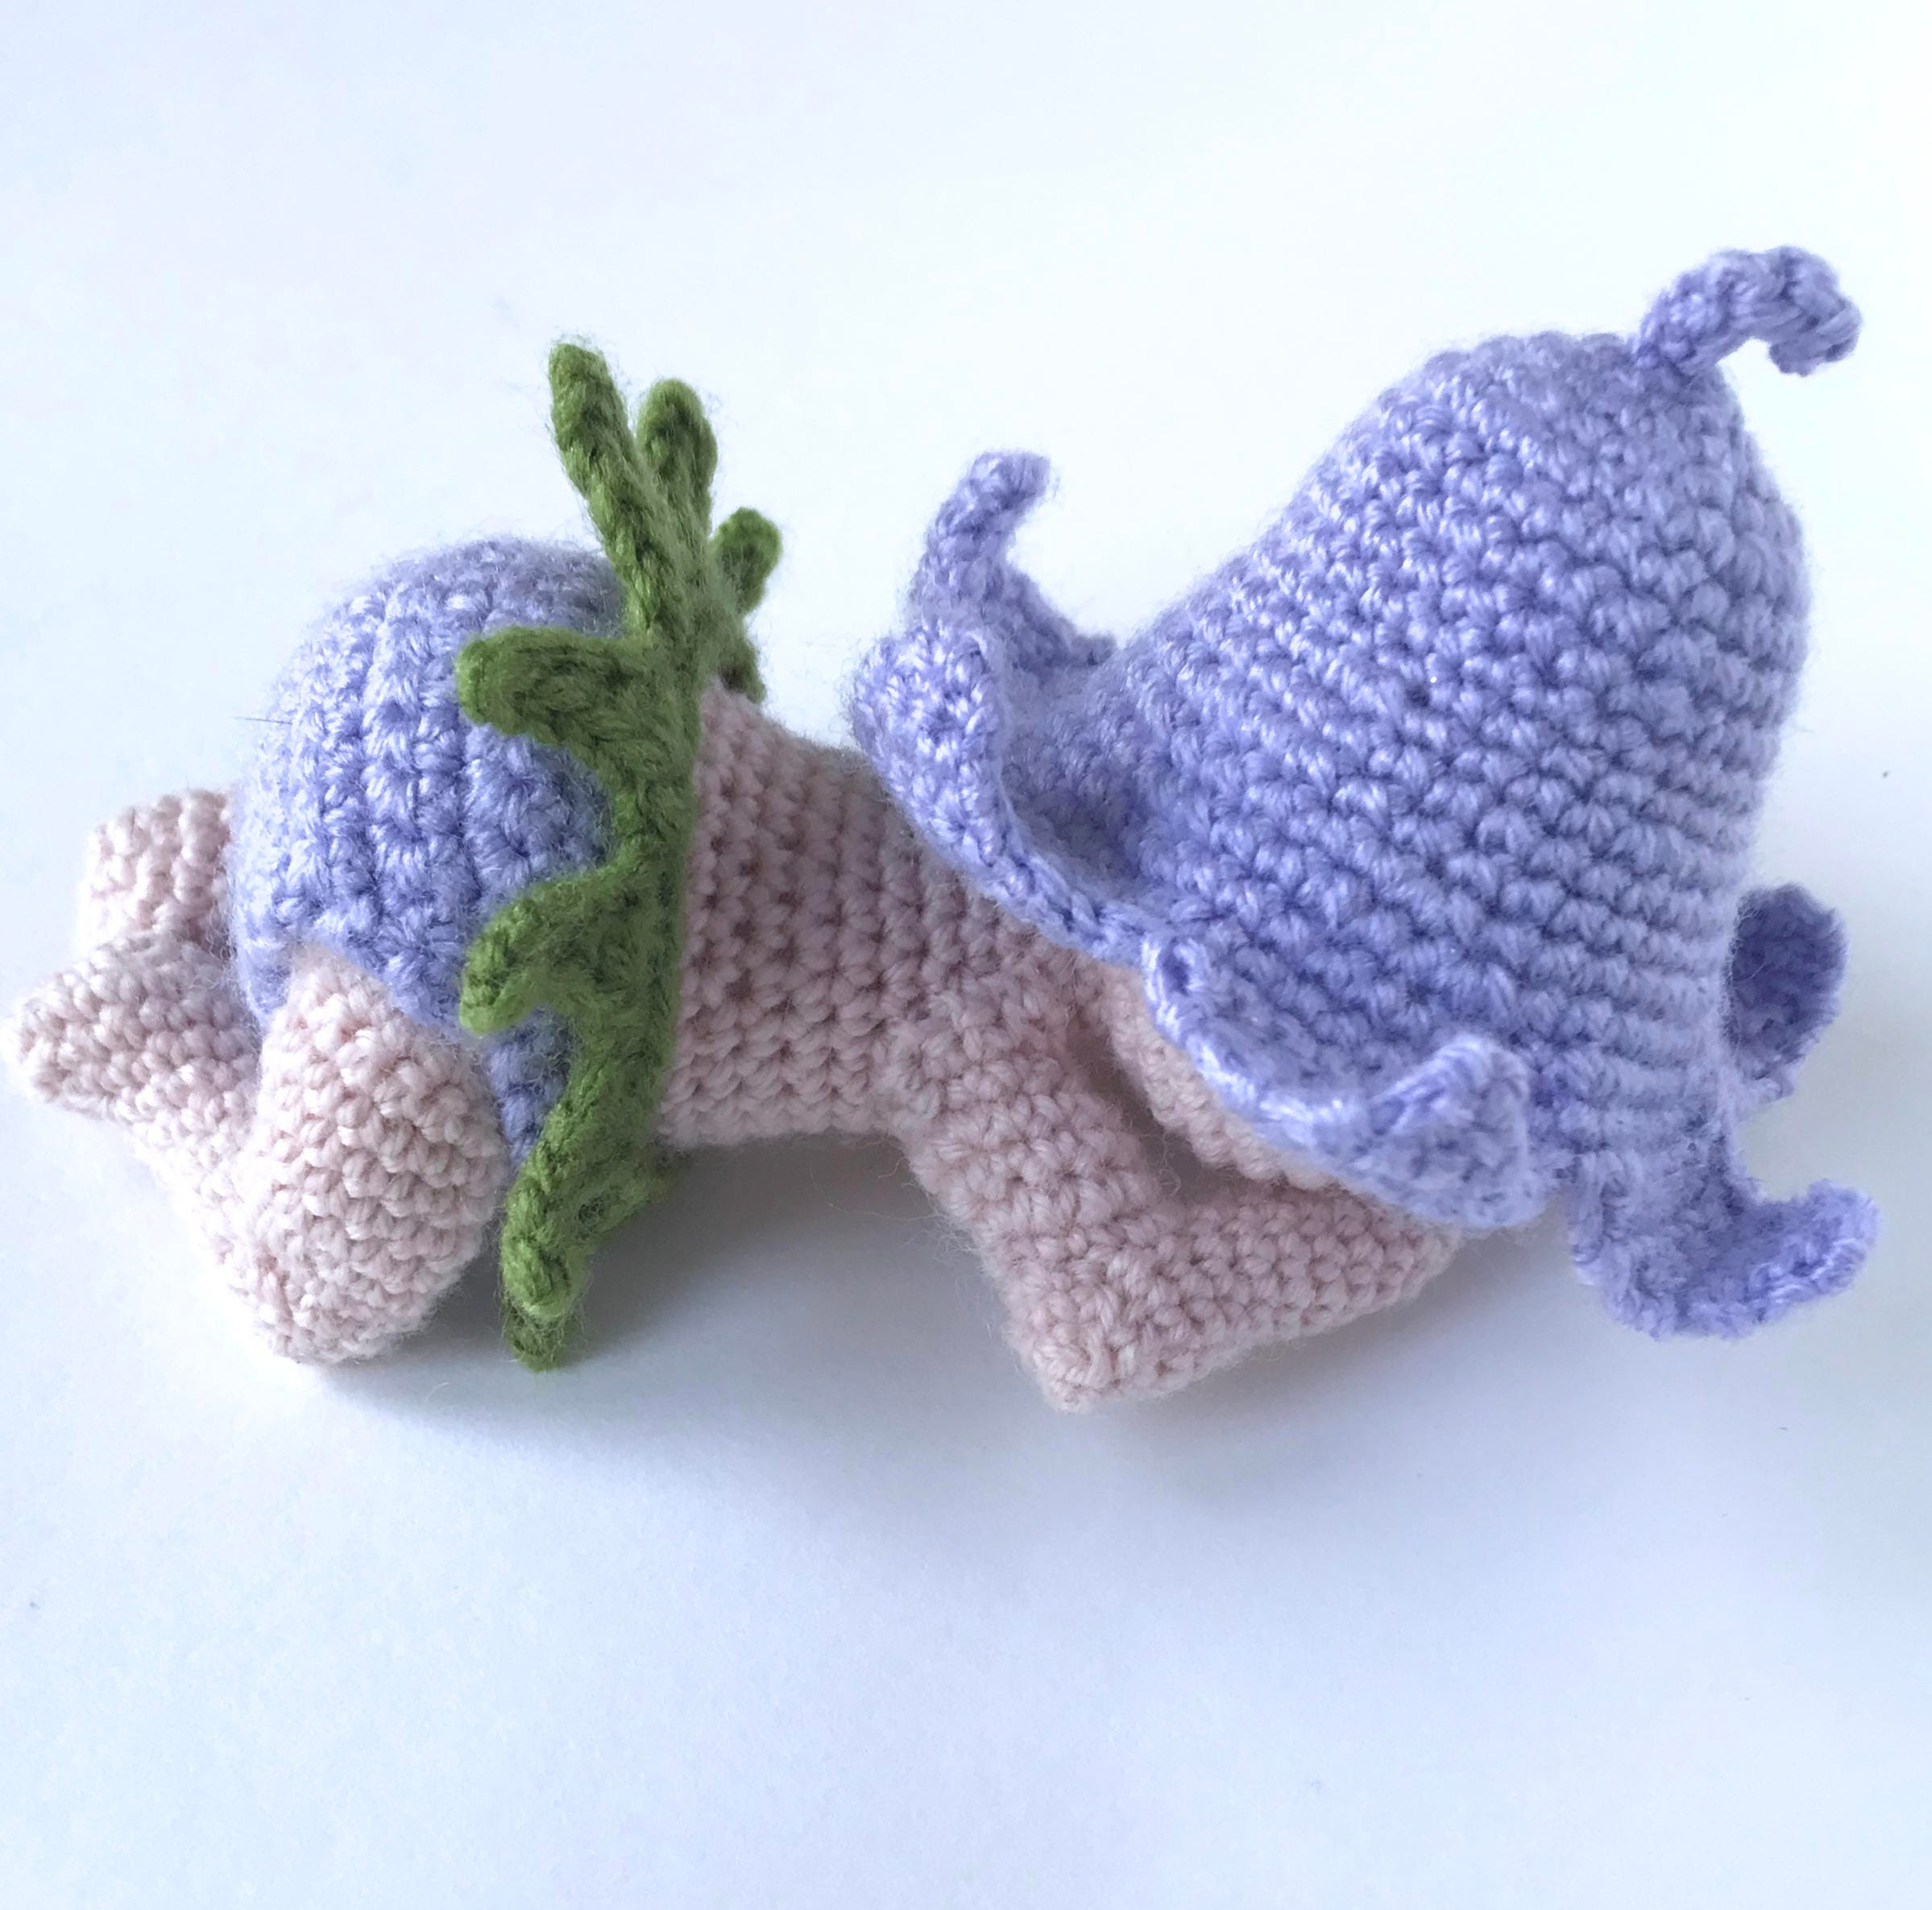 Crochet Bluebell Pattern Crochet Newborn Baby Outfit Pattern Etsy